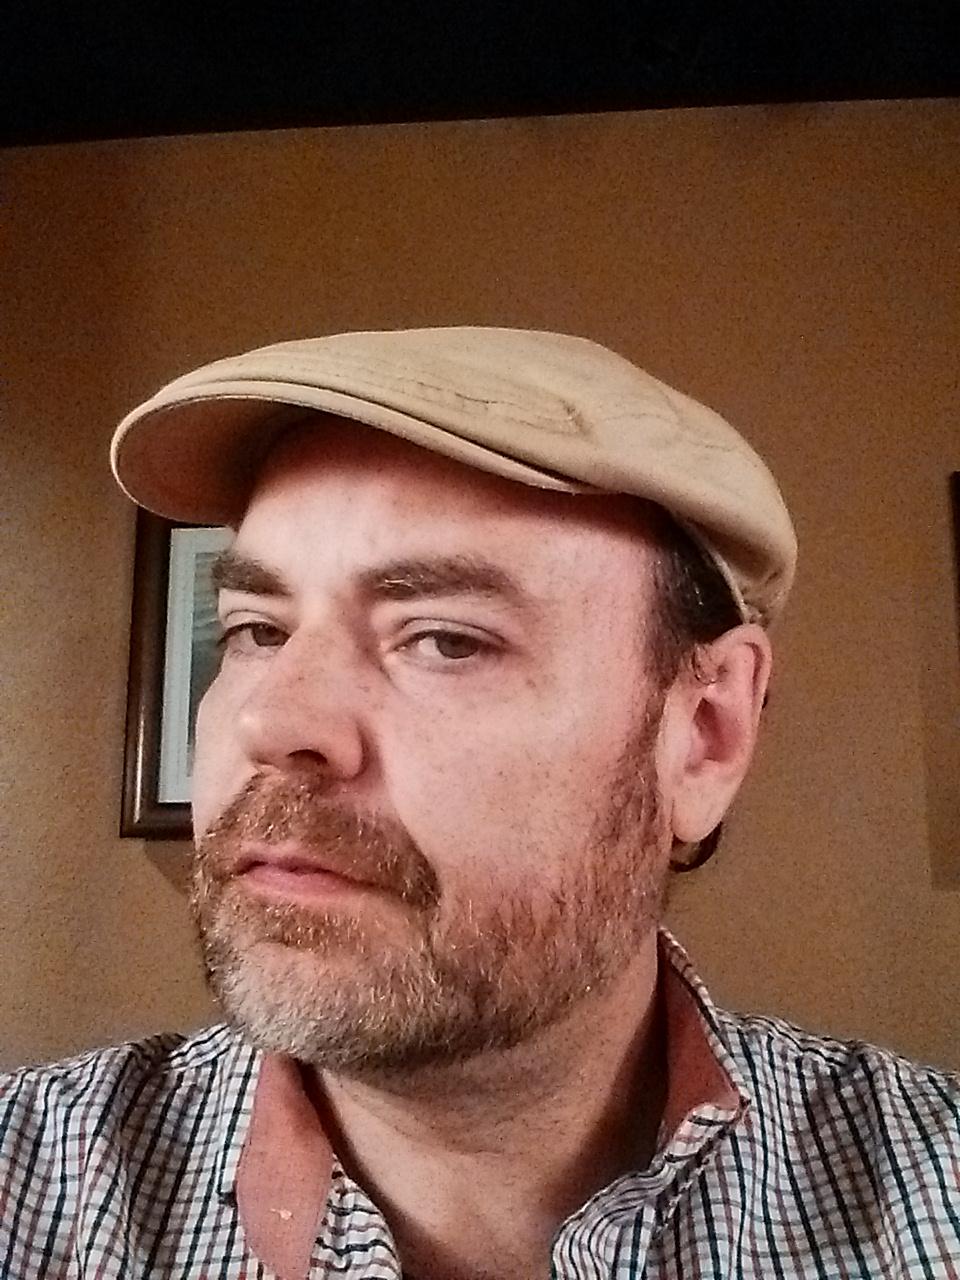 E. L. Fortner to Return for DerpyCon 2016